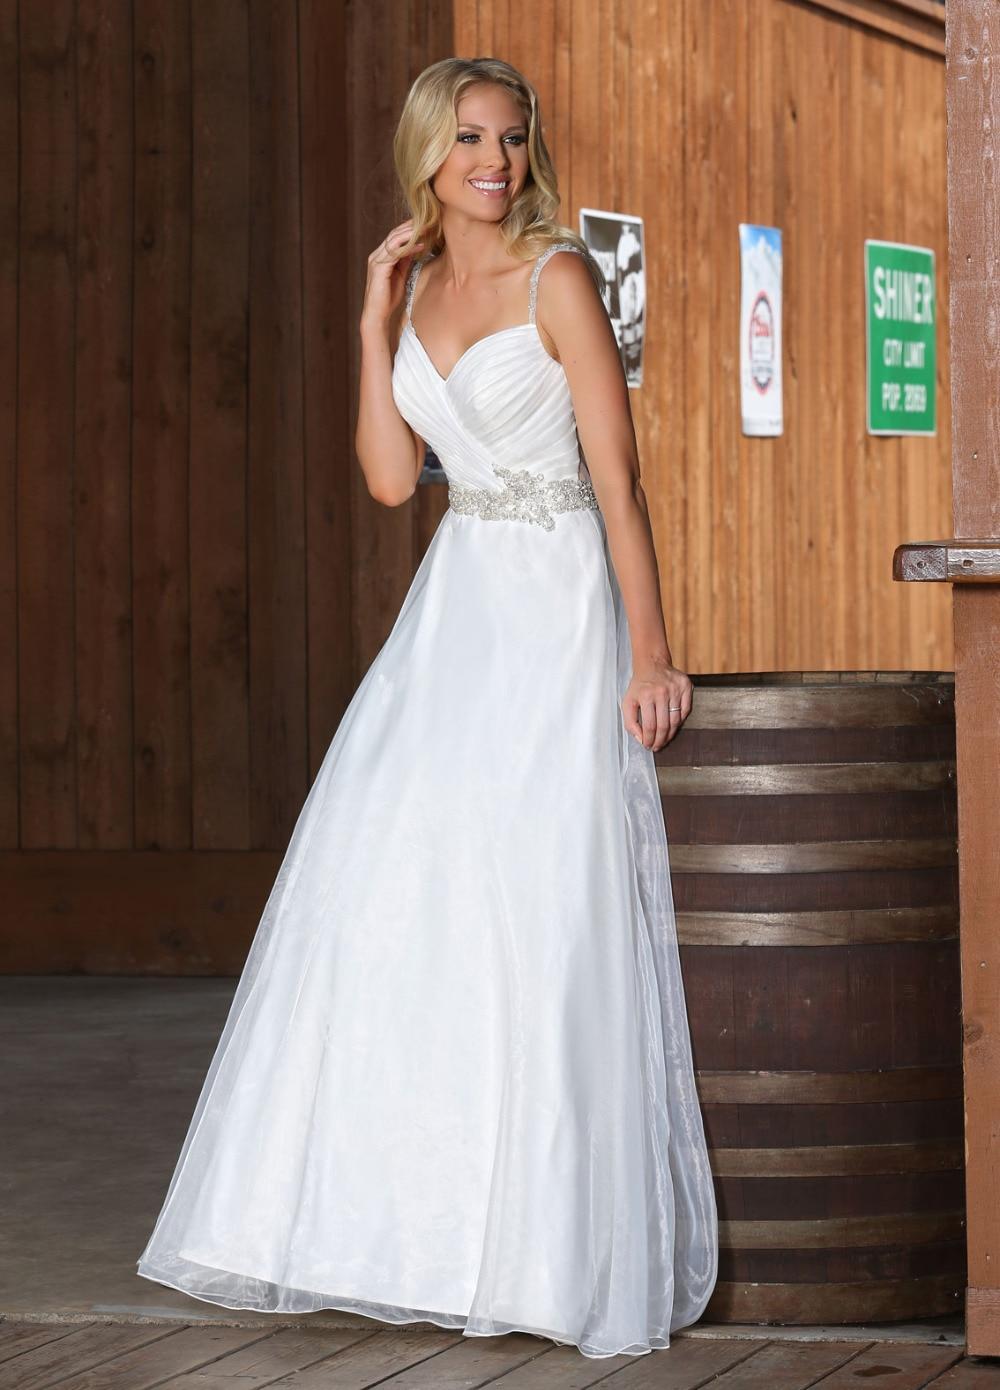 melissa sweet wedding gowns wedding dresses for cheap Wedding Dresses Bridal Gowns David s Bridal